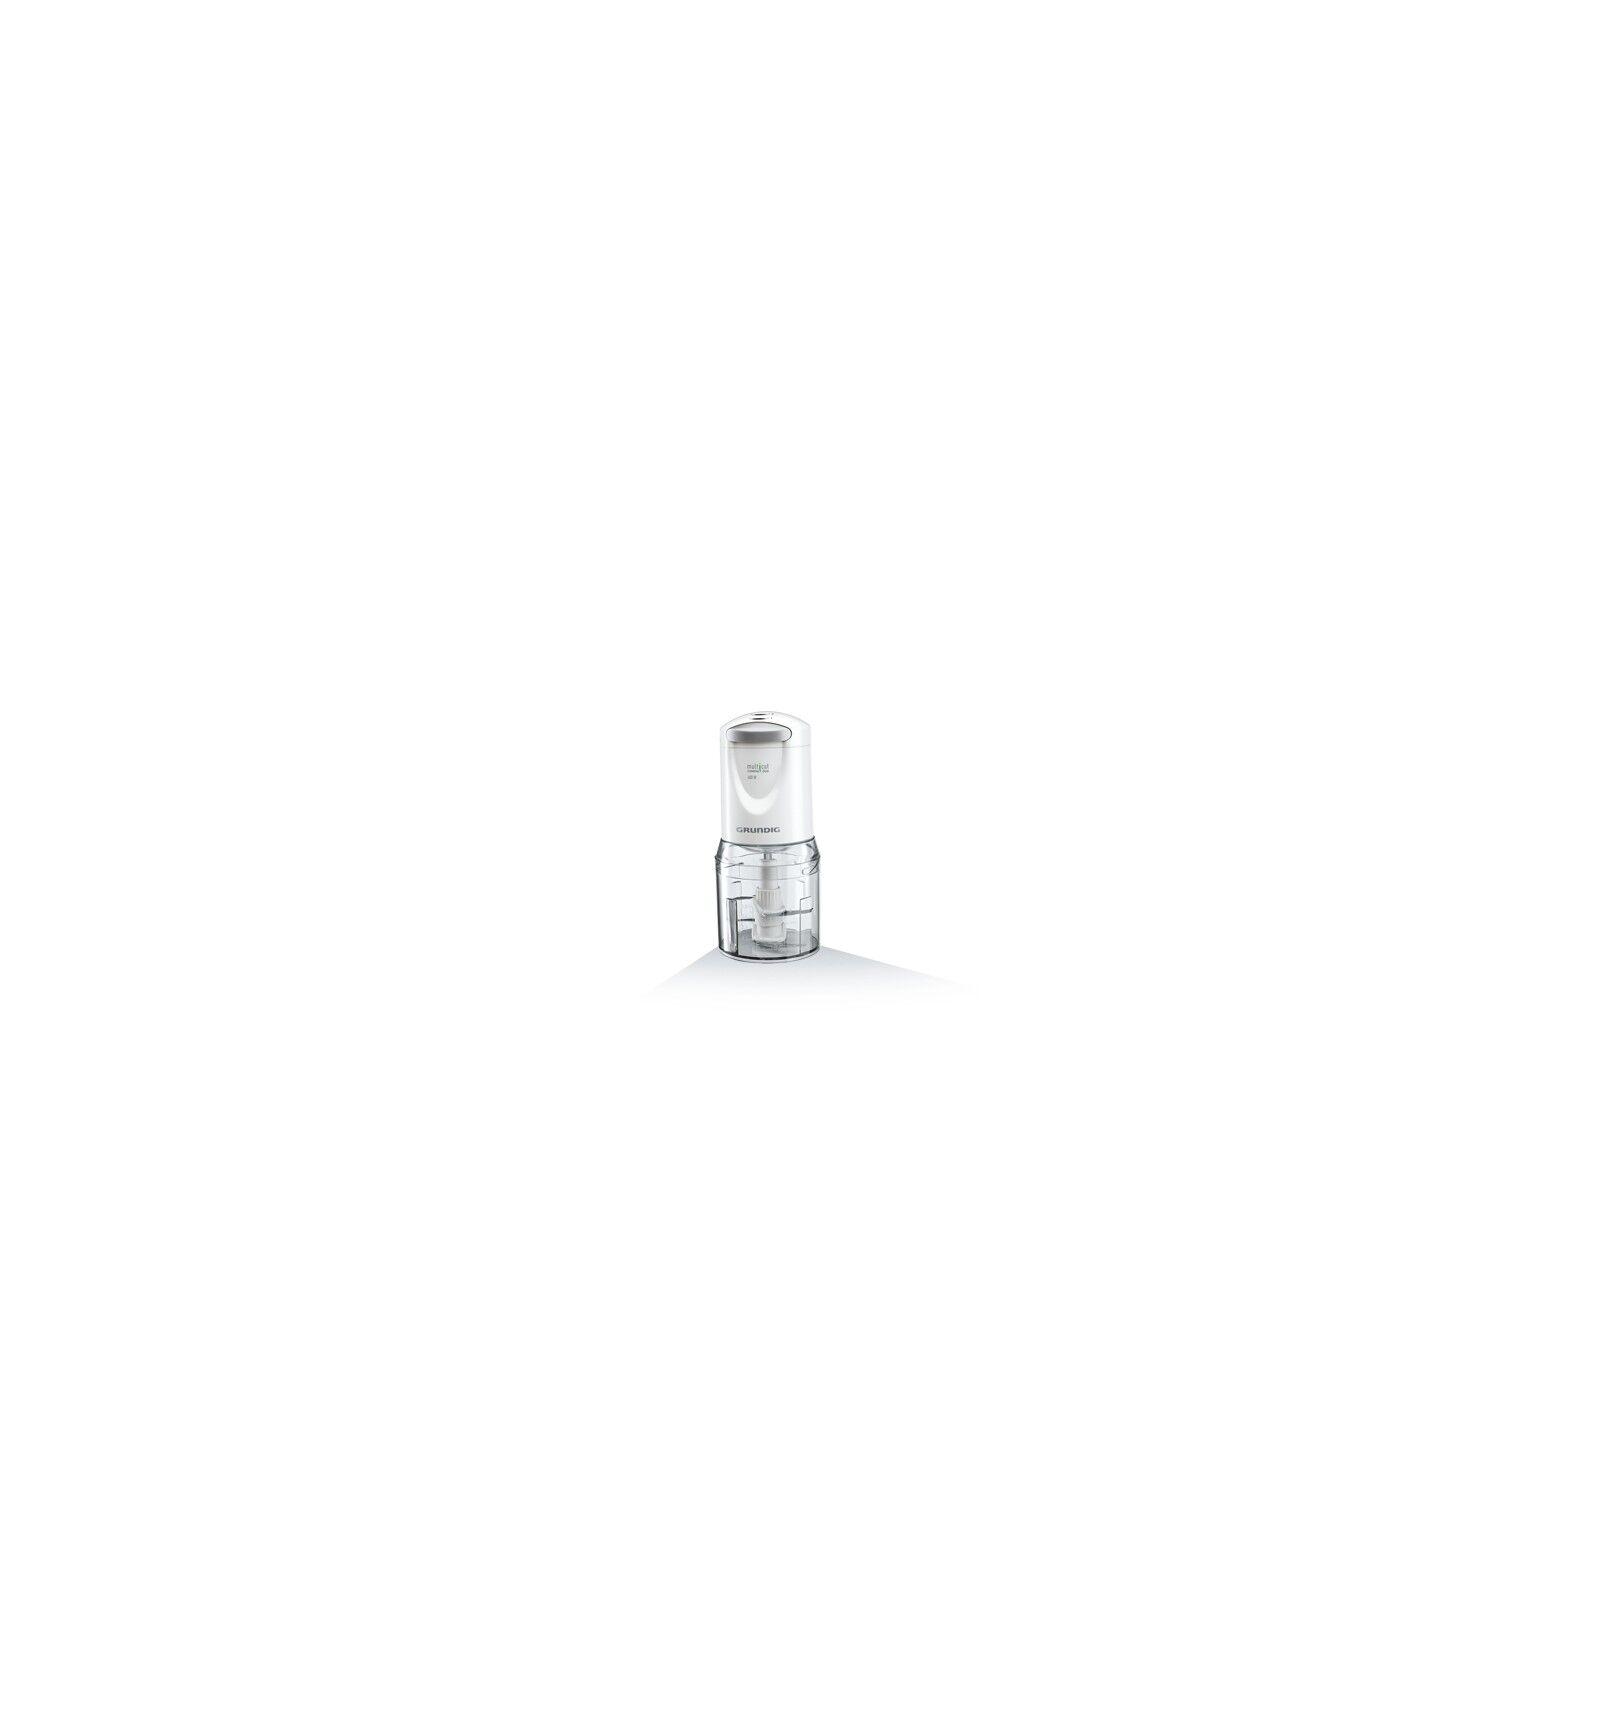 Grundig MM 5150 monitoimikone 0,5 L Valkoinen 400 W